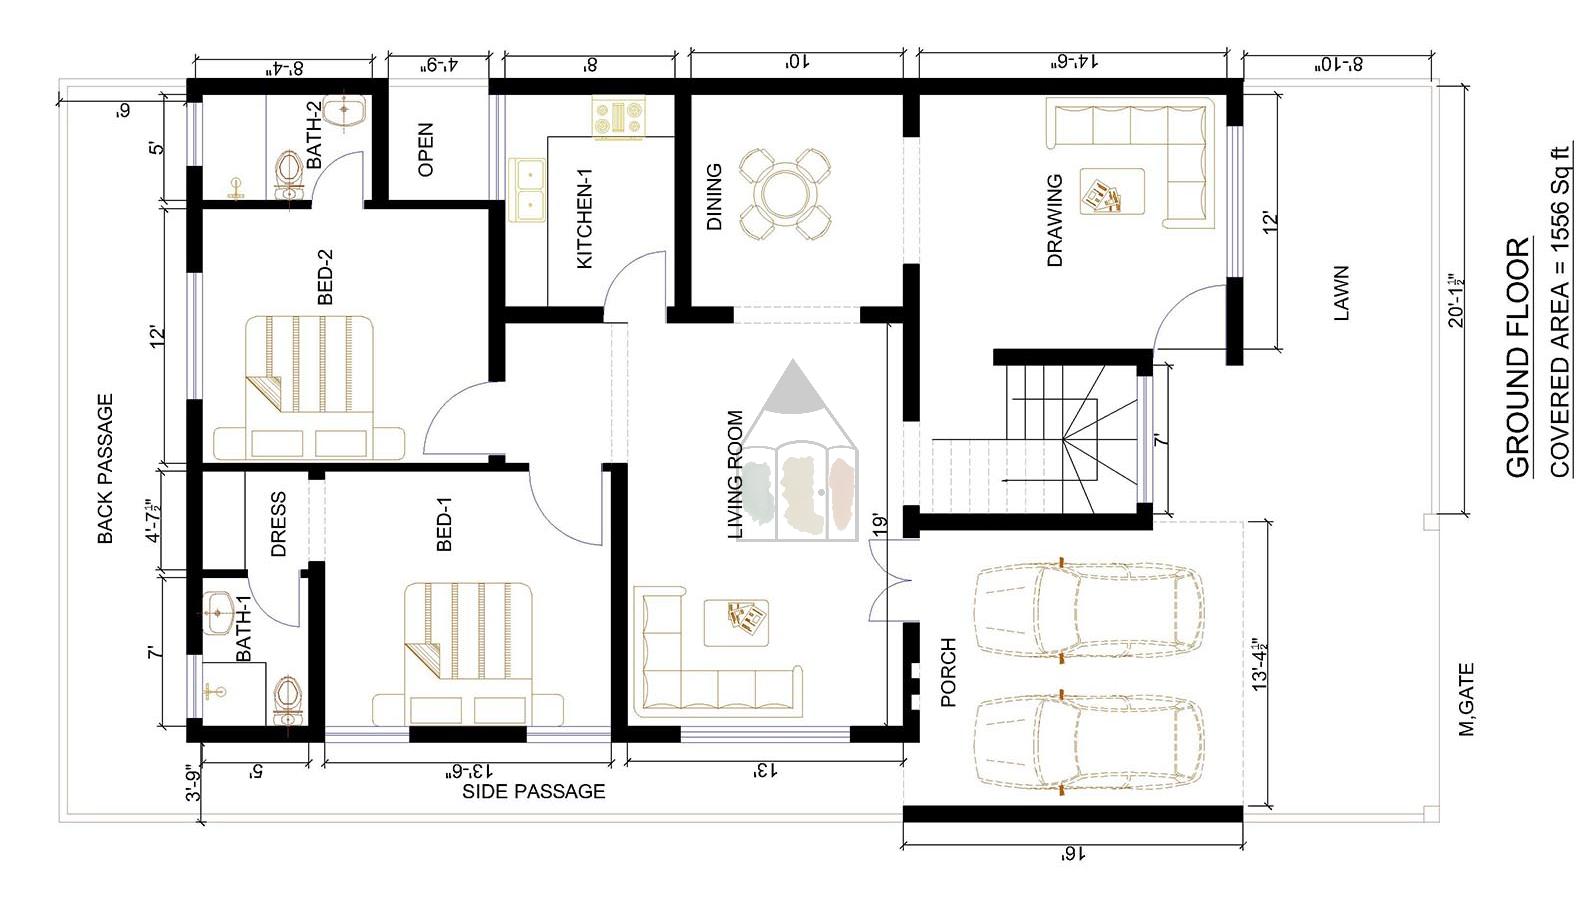 Pin By Saifullah On House Plans